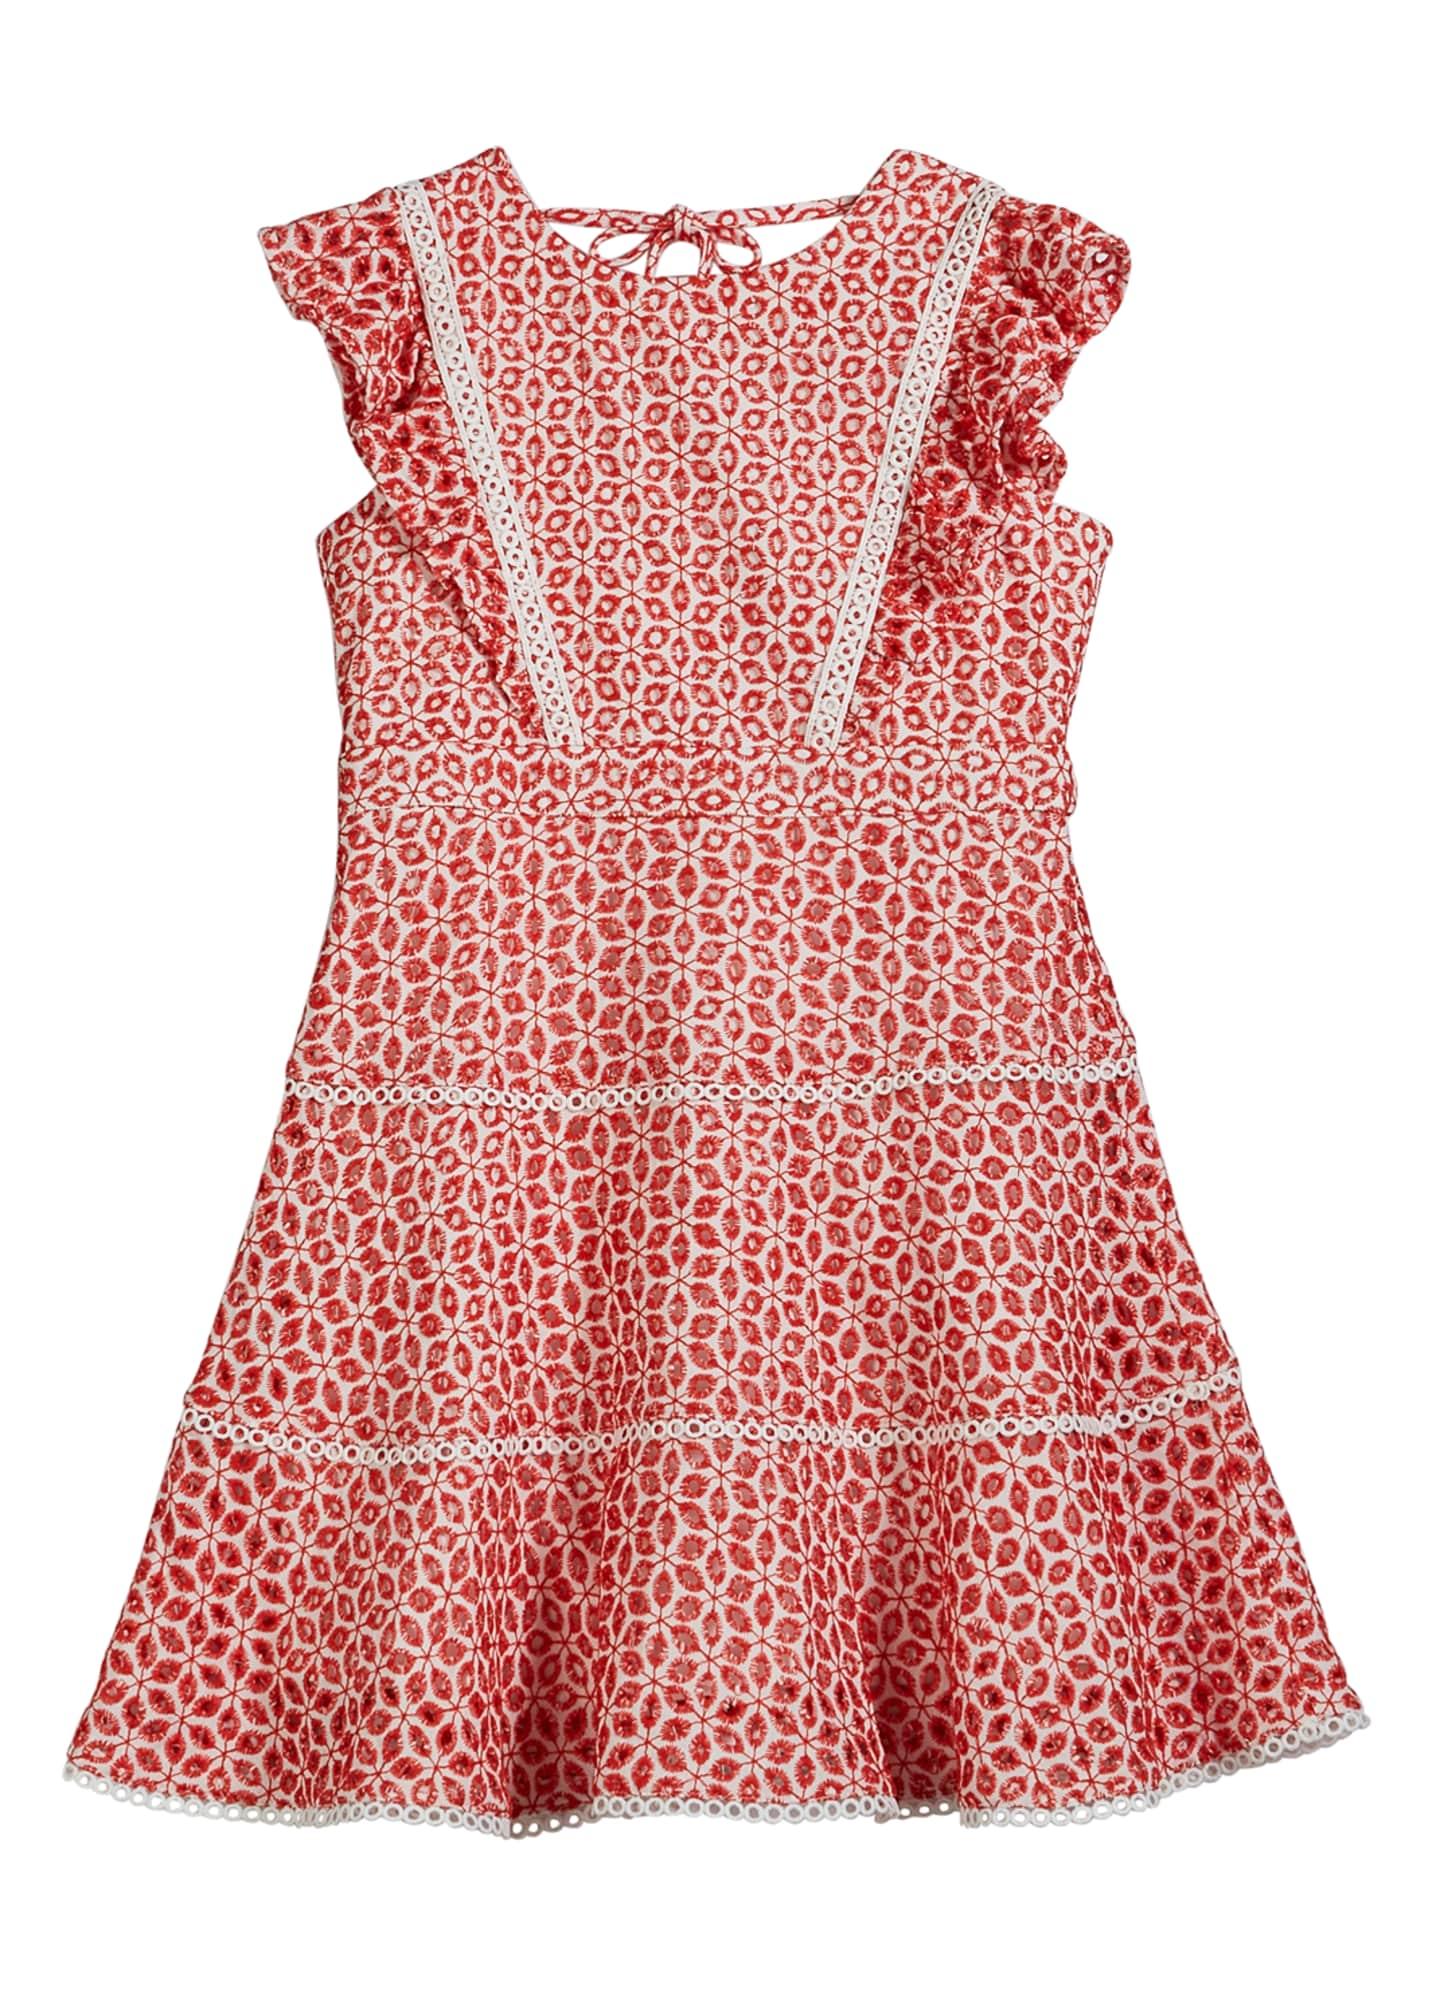 Bardot Junior Selena Two-Tone Eyelet Lace Dress, Size